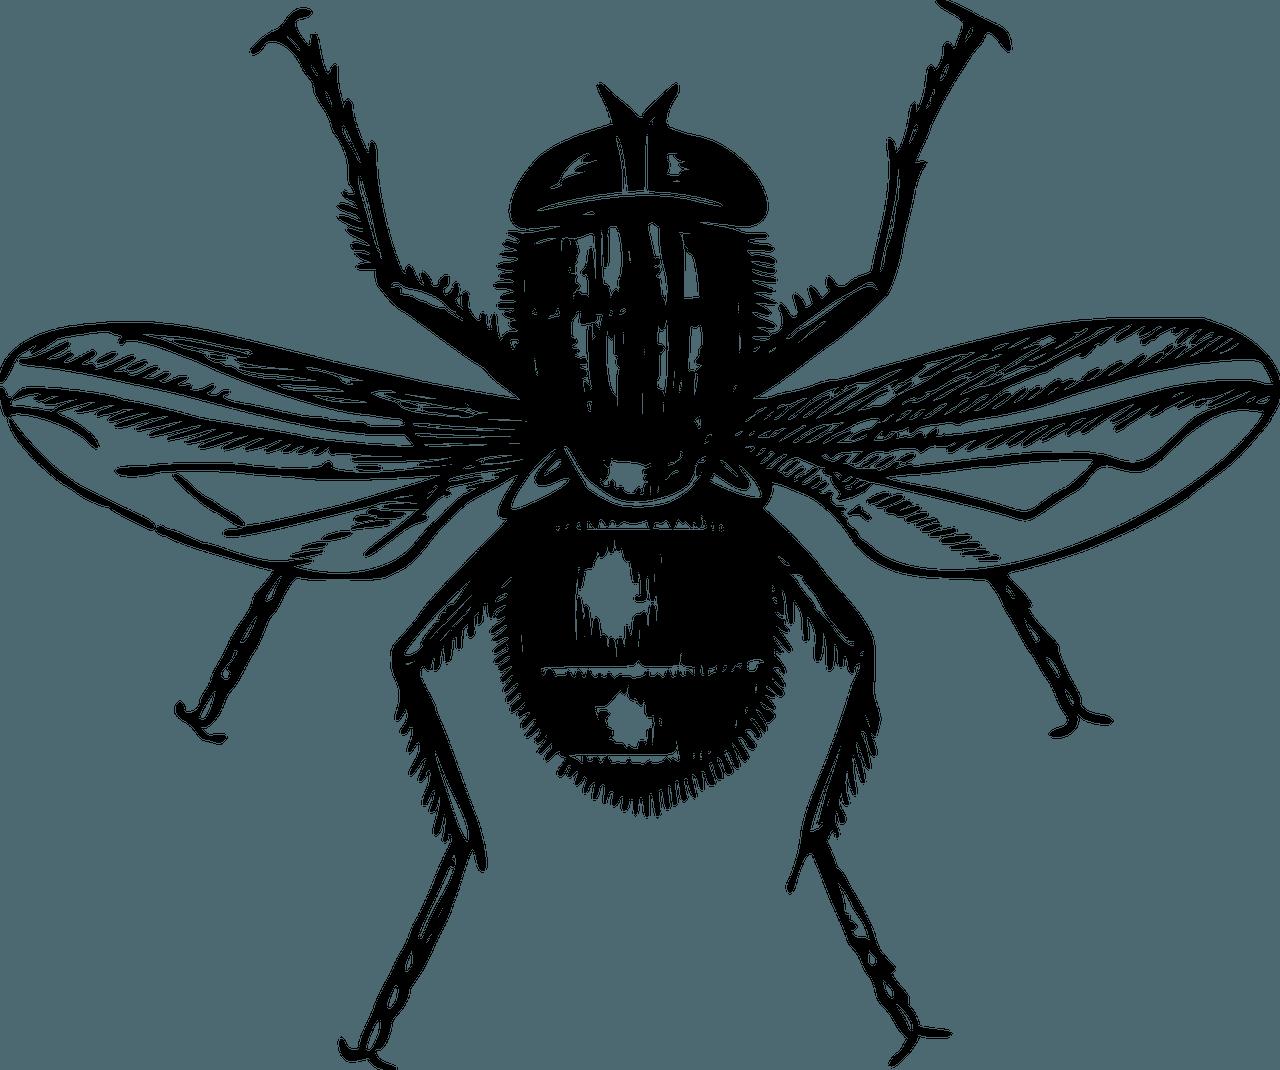 Disinfestazione mosche: perché è importante